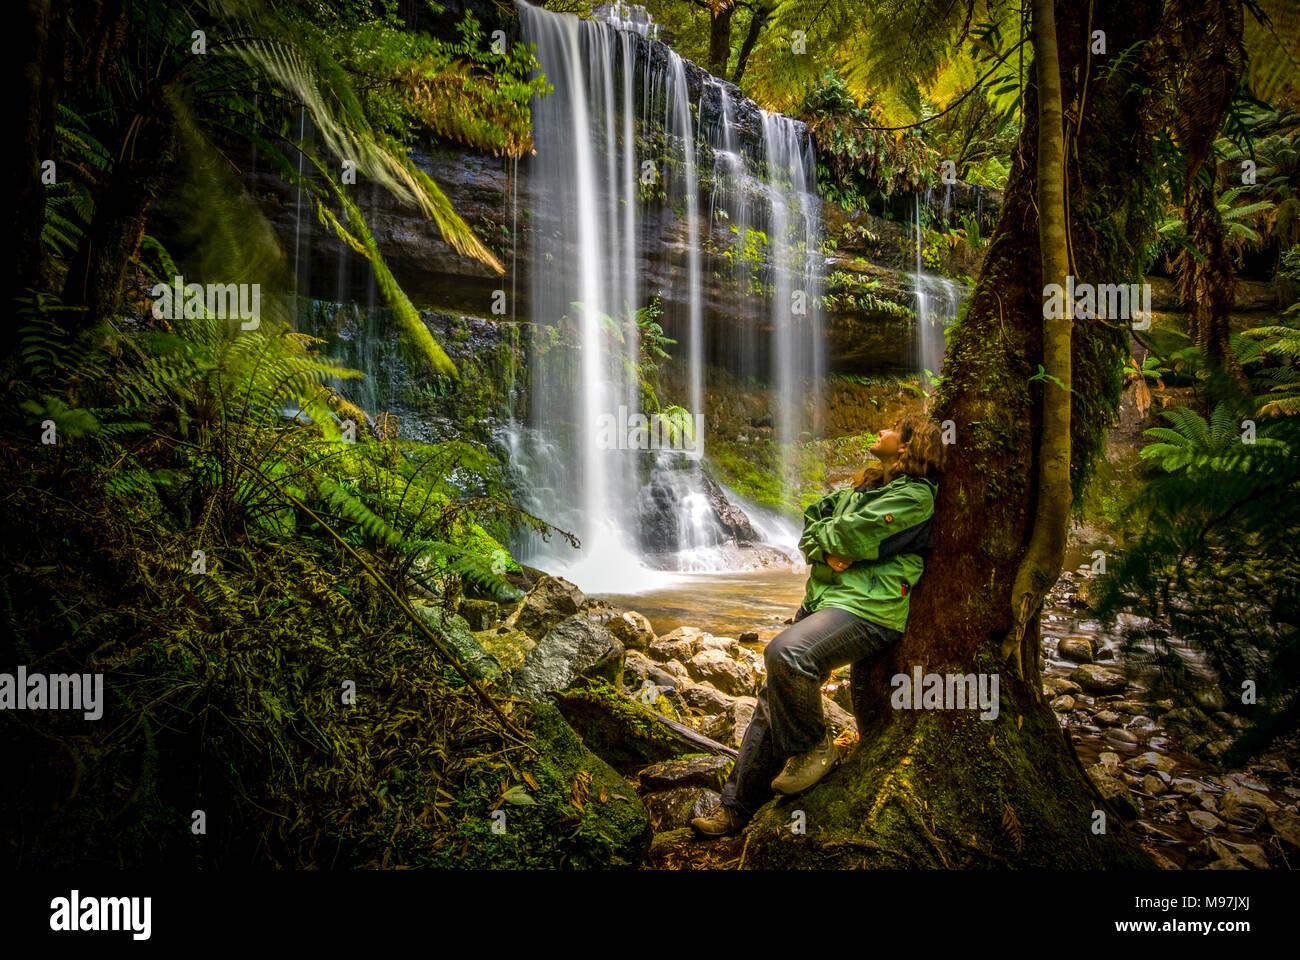 Australien, Tasmanien, Urwald, Wasserfall, Wasser, Russell Falls, Mount Field National Park Stockbild